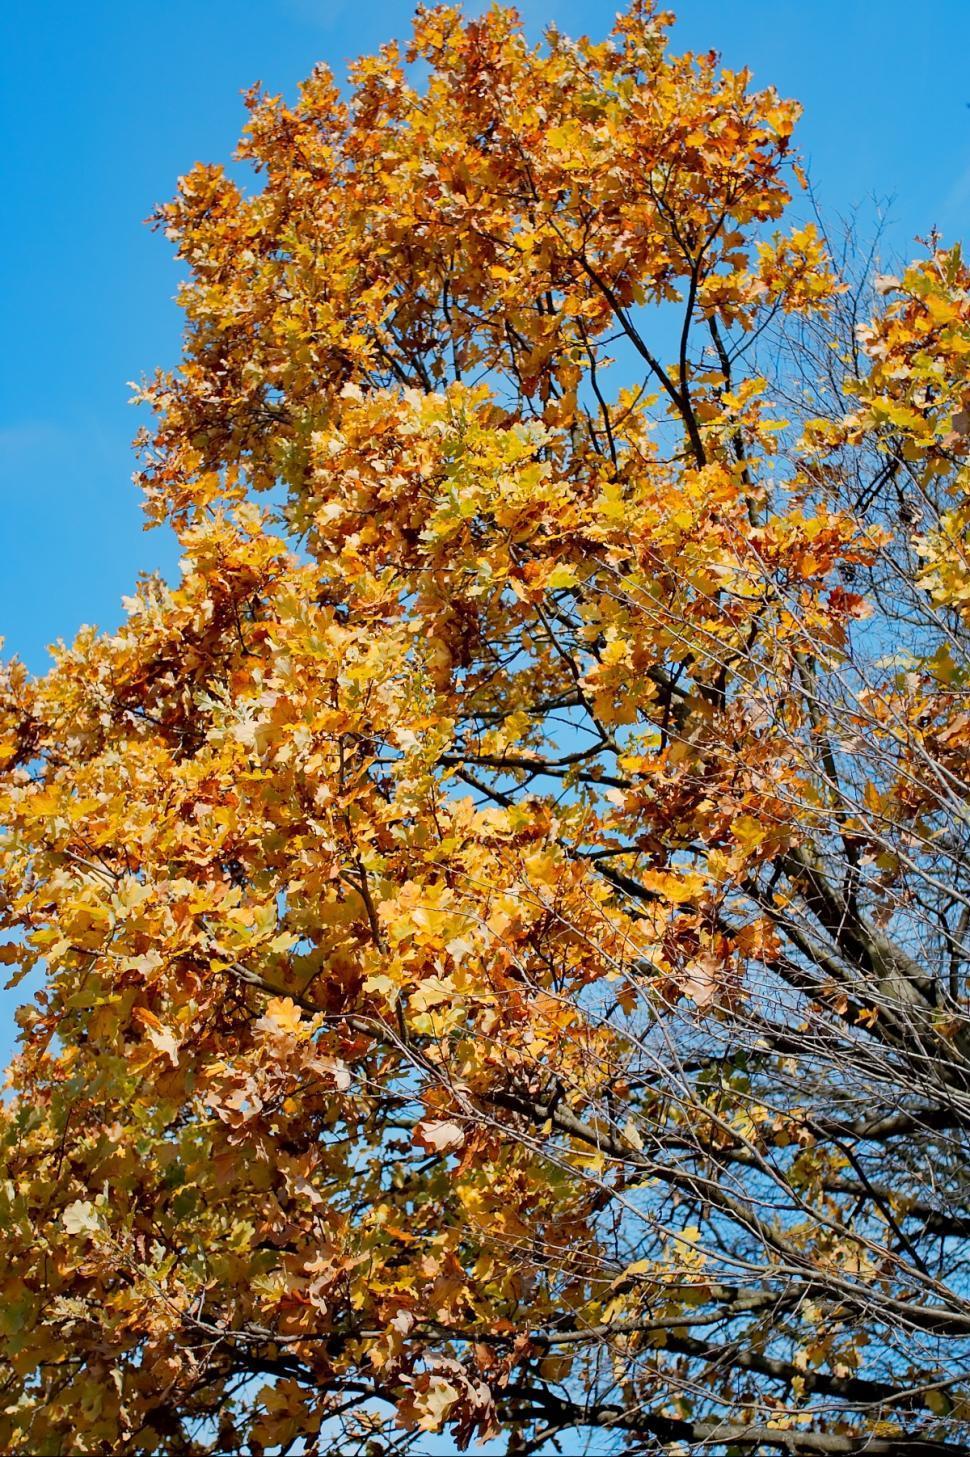 Download Free Stock Photo of Oak tree in Autumn